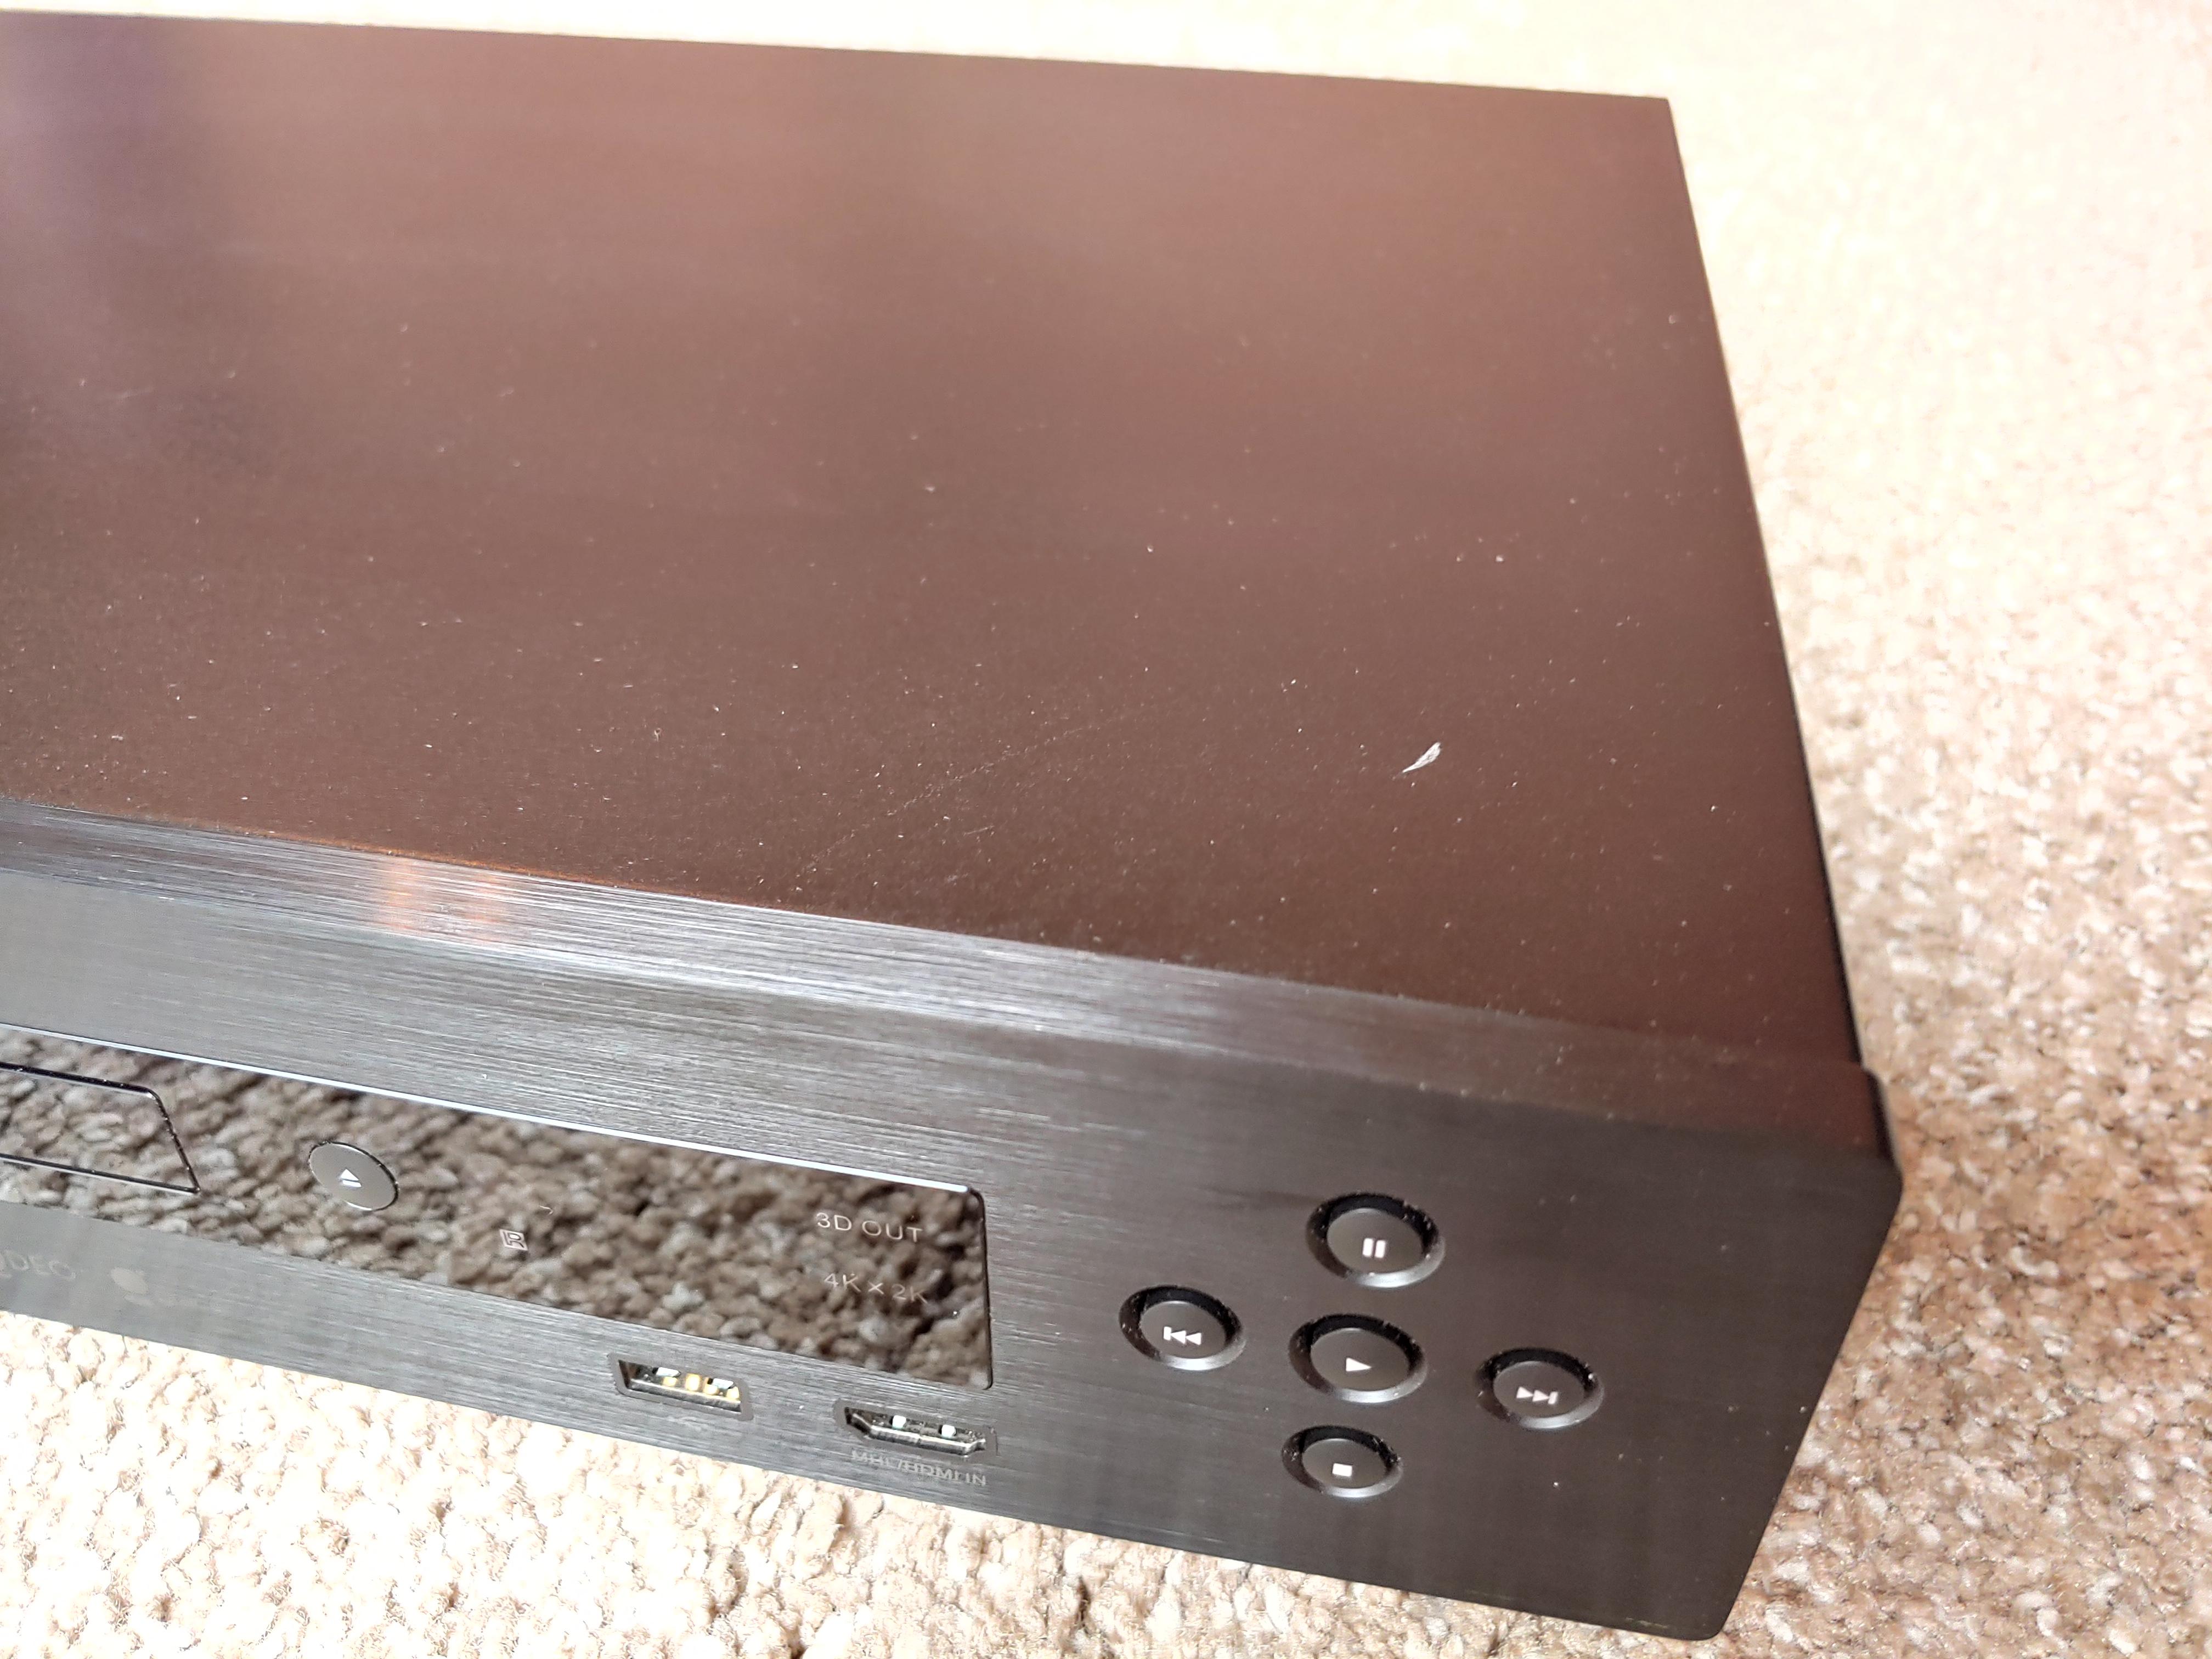 H] Oppo BDP-103 Blu-ray/SACD player [W] Bluesound Node 2